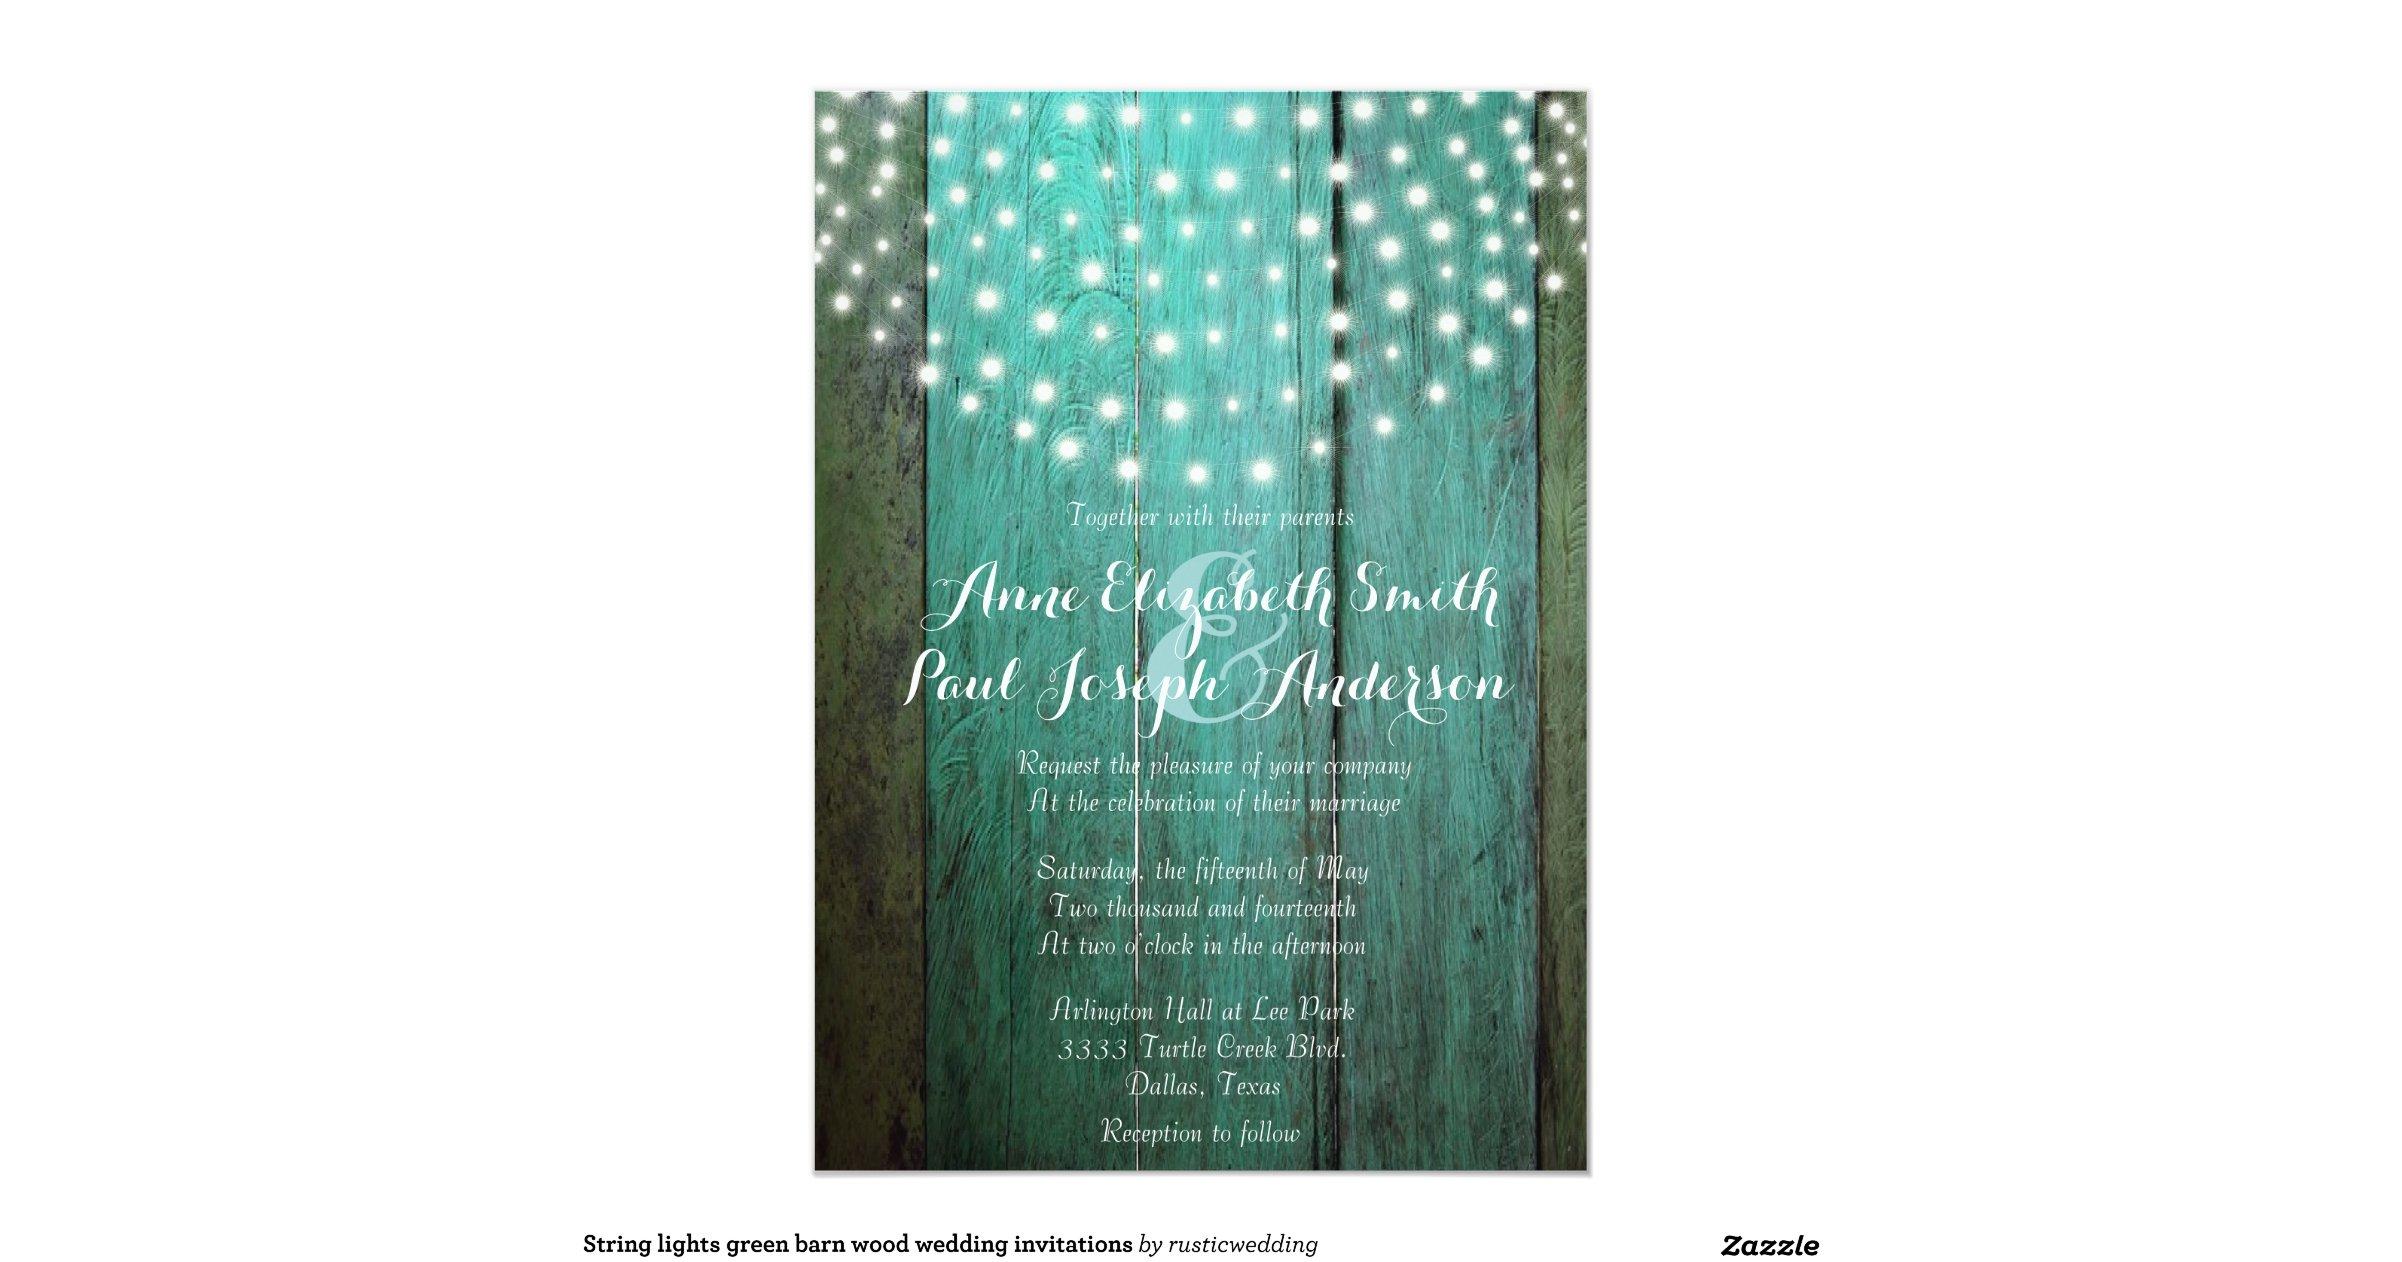 Zazzle String Lights : string_lights_green_barn_wood_wedding_invitations-r73f857371d6648ff97970fad98ea0fe0_zkrqs_1200 ...